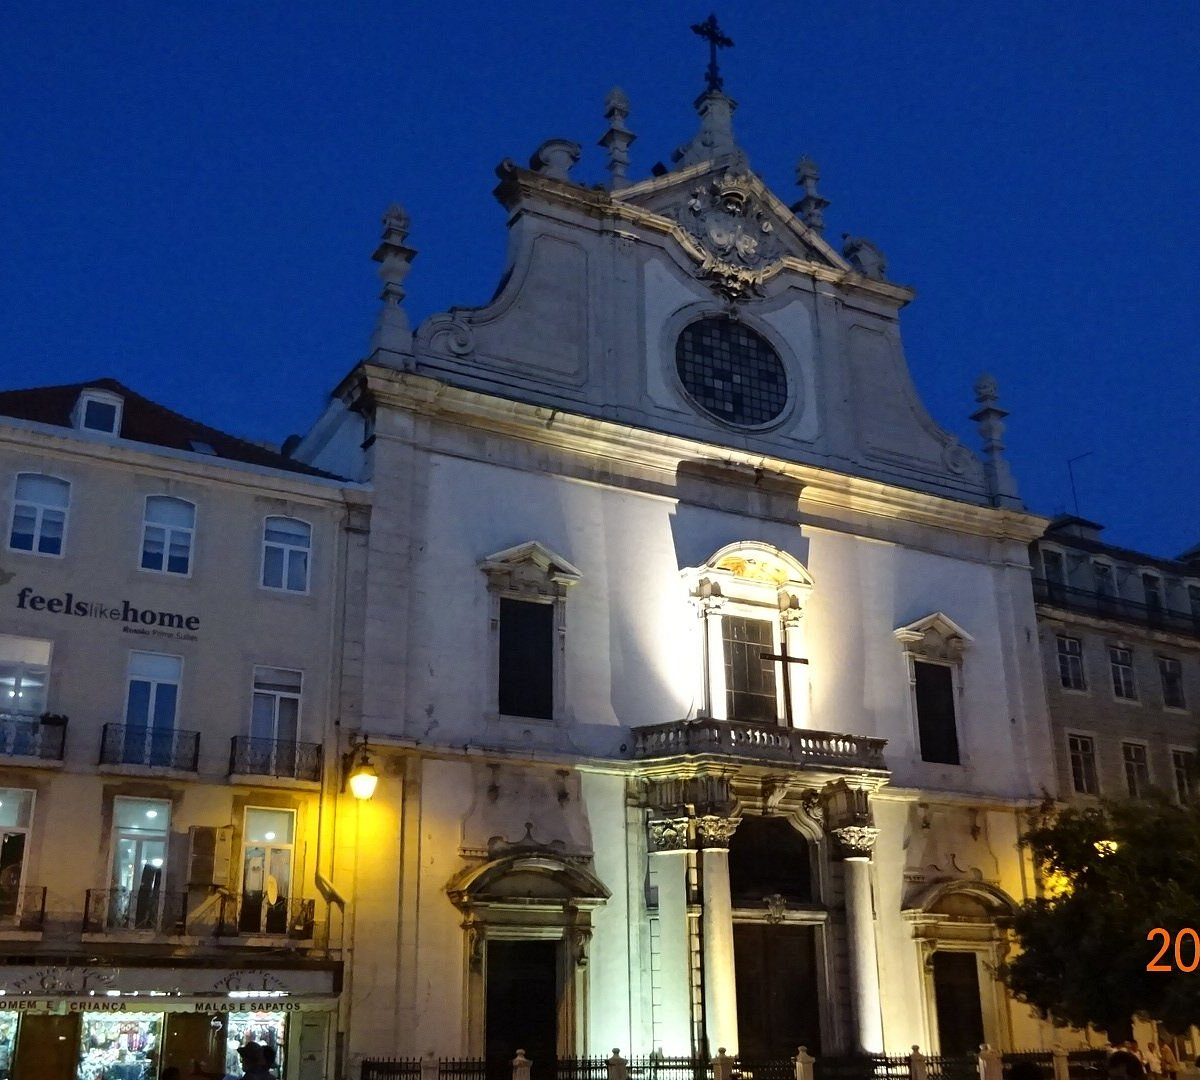 pt-lisbon - リスボンの街歩き 大聖堂とアルファマ地区 - 旅ログヨーロッパ, ポルトガル街歩き